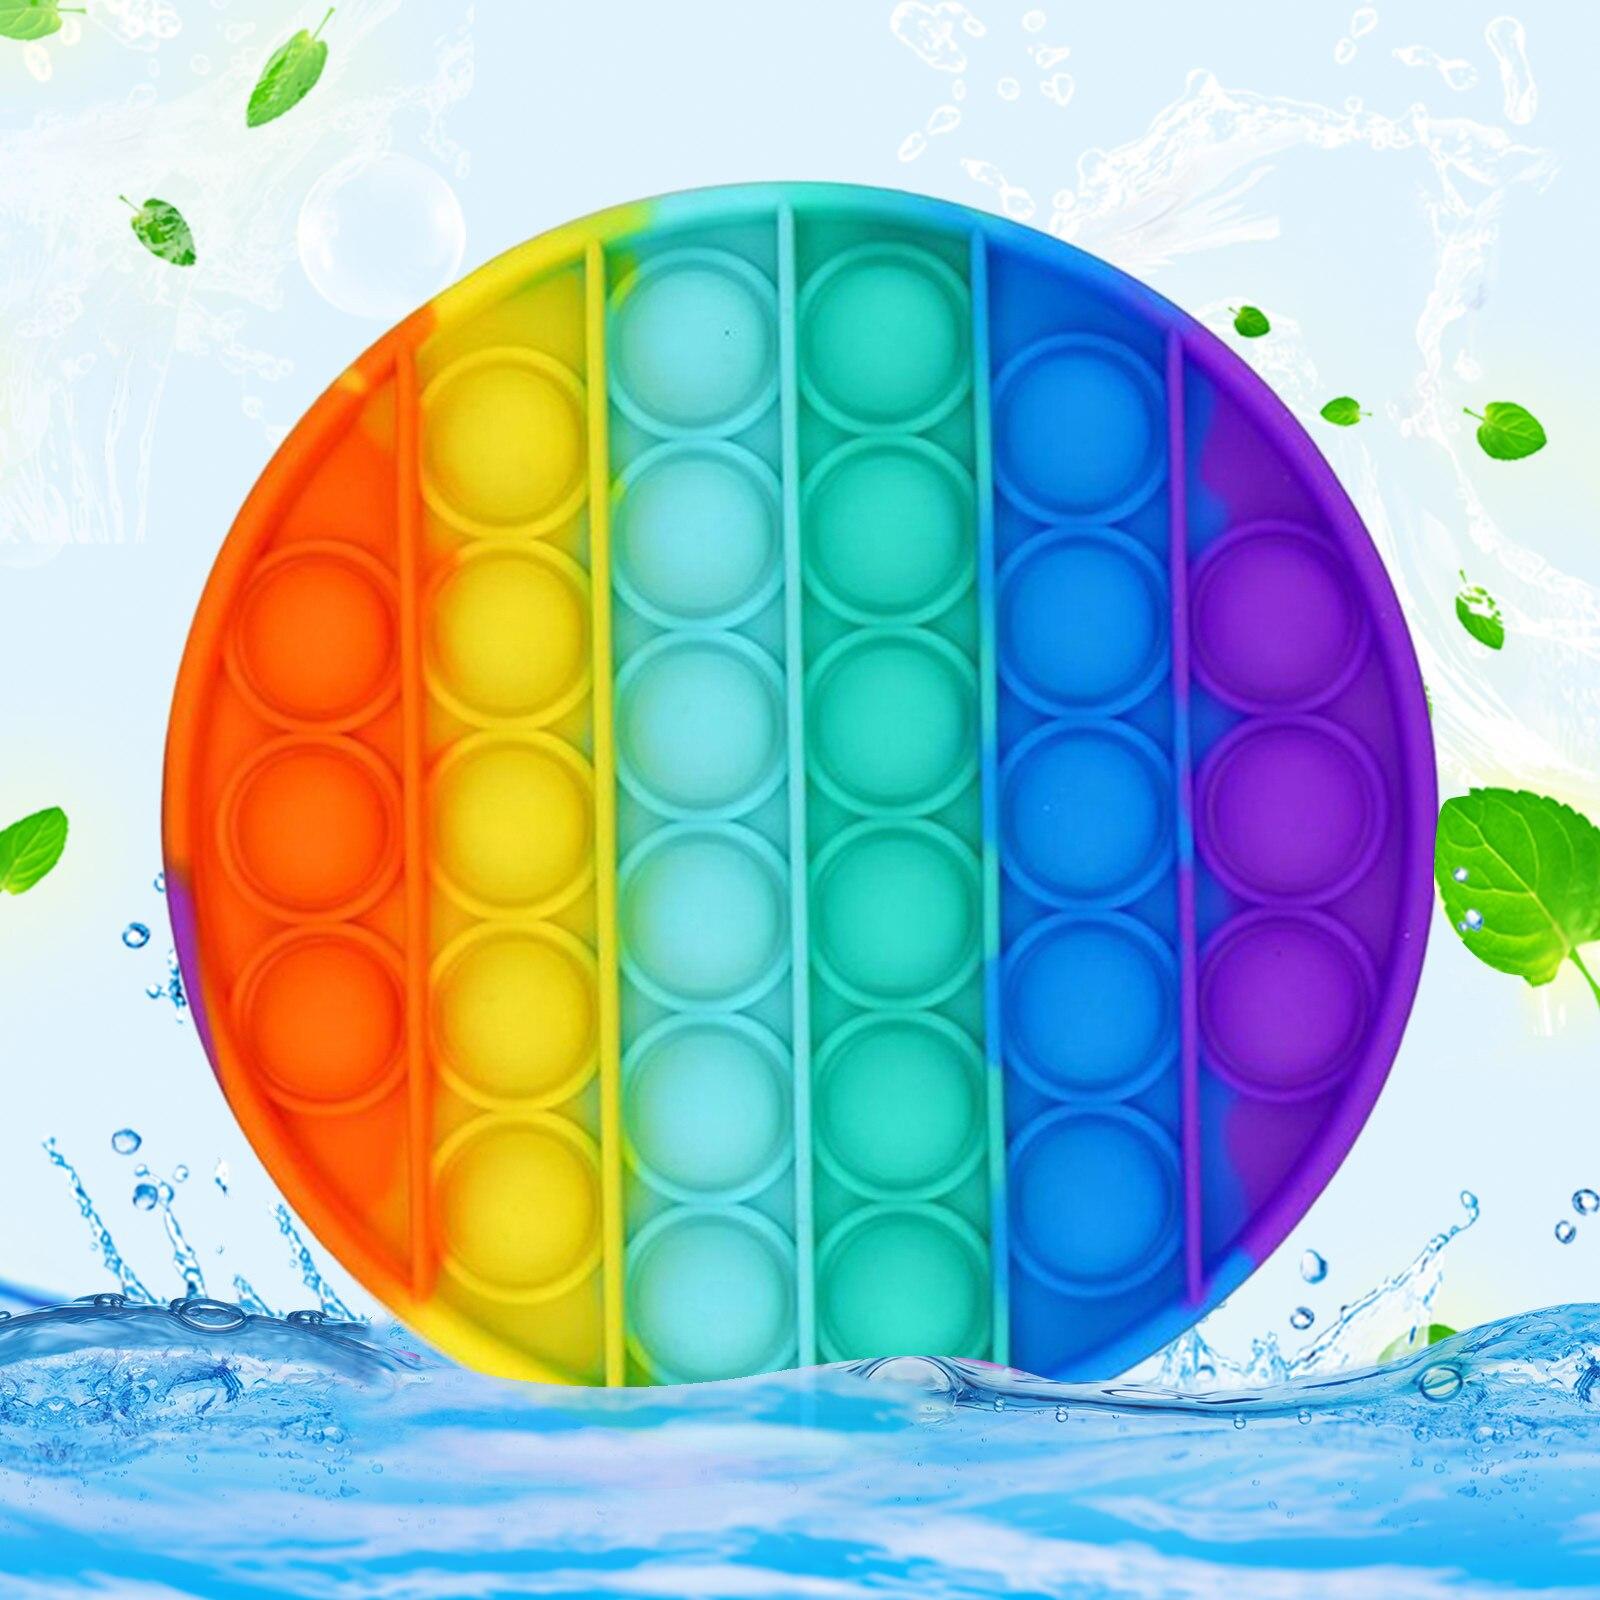 Stress-Toys Fidget Funny Gift Push Bubble Pops Reliever Special Children 1pc Autism Juguetes img5